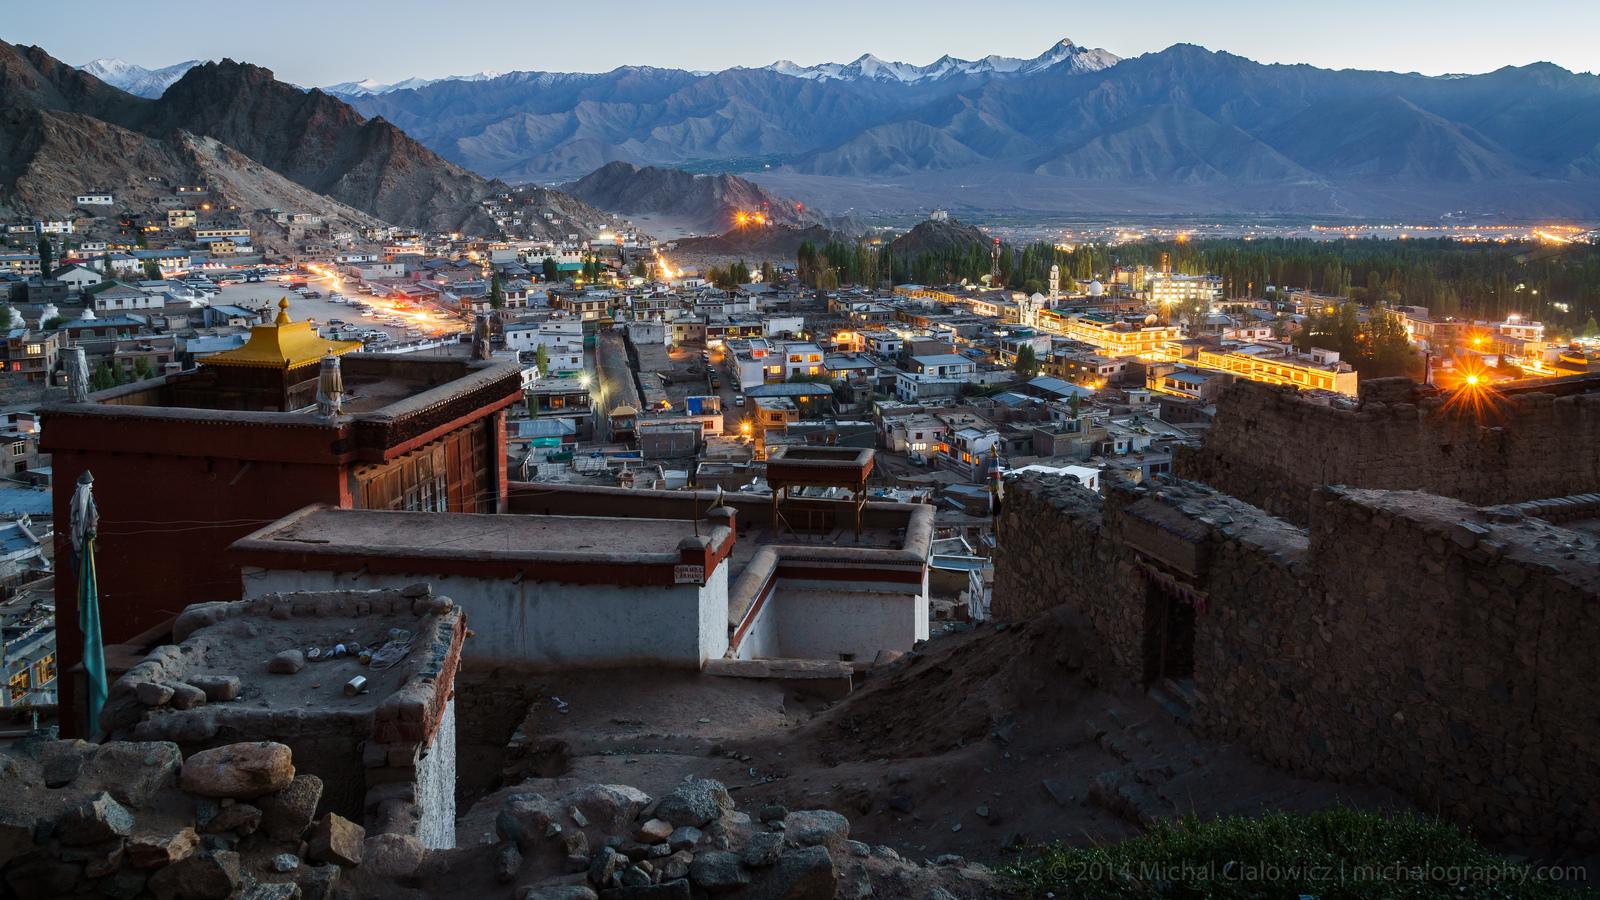 Dusk in Leh, Ladakh (Sony A6000 + 16-70mm f/4 OSS)